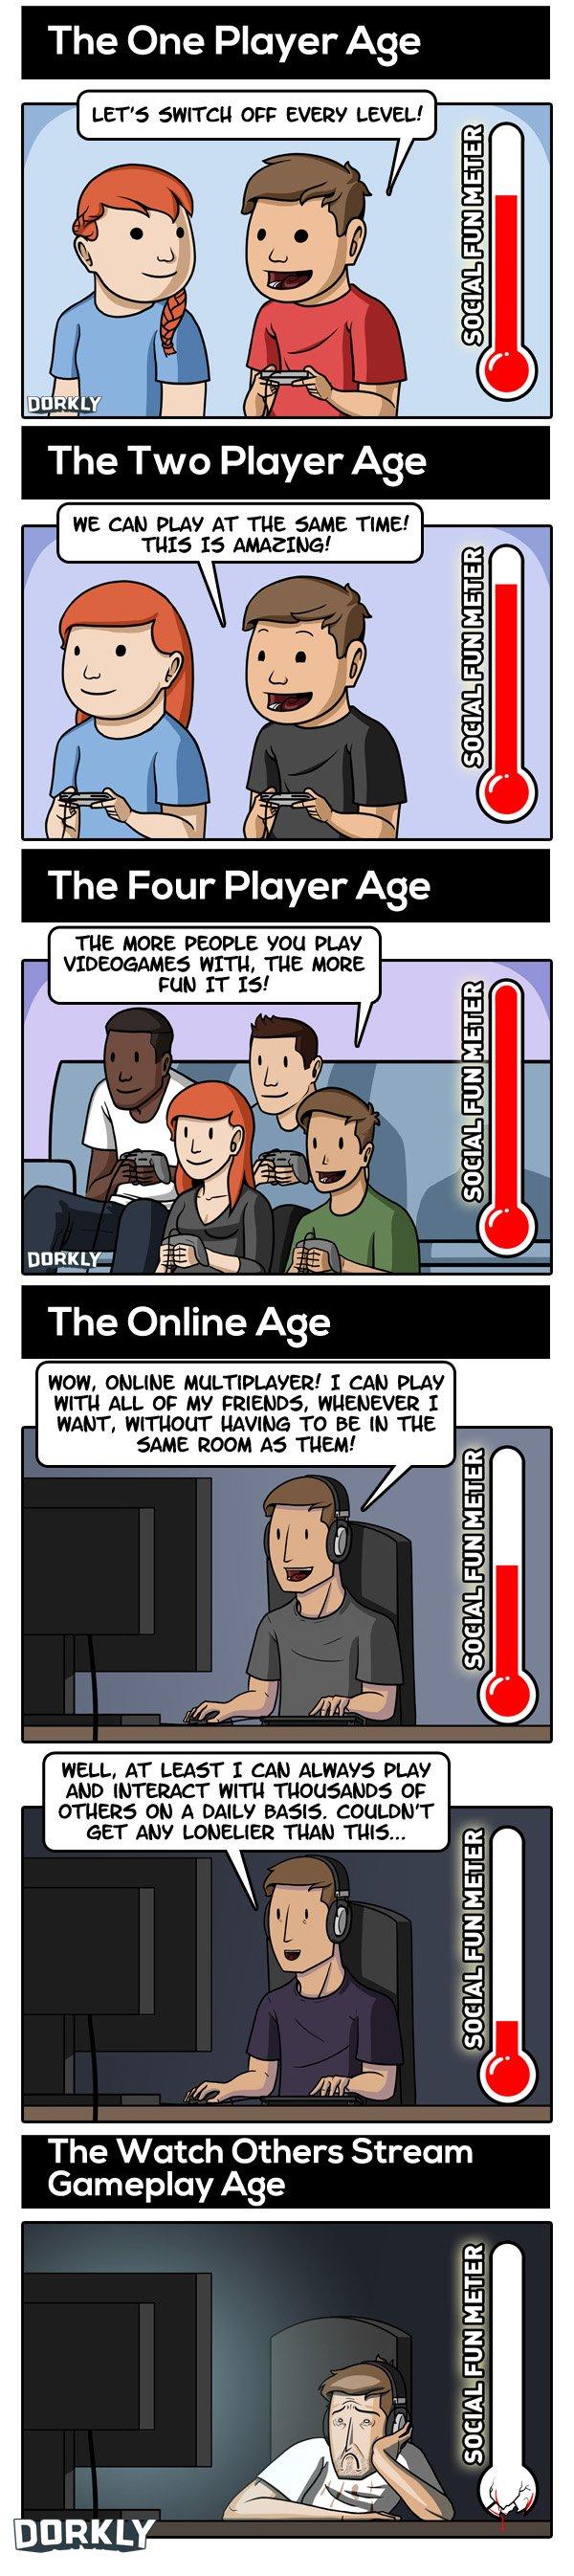 multiplayer gaming